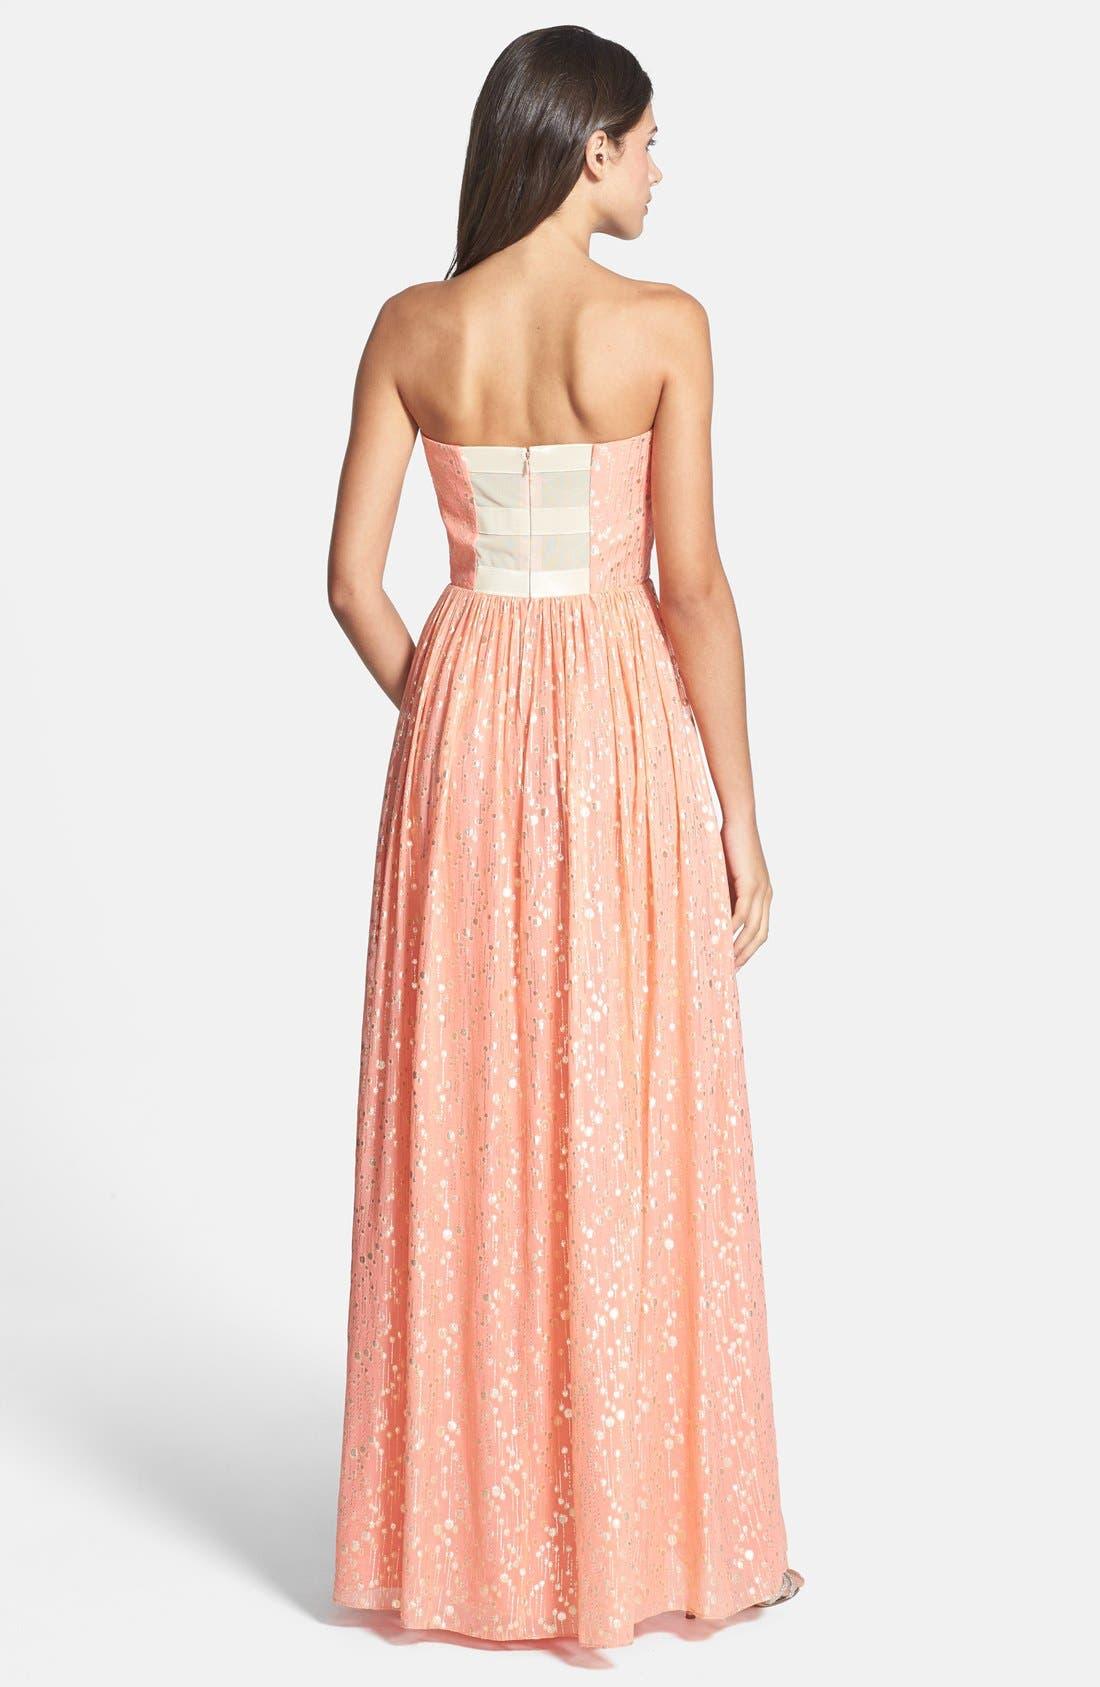 ERIN ERIN FETHERSTON, 'Monique' Foiled Silk Chiffon Gown, Alternate thumbnail 3, color, 950